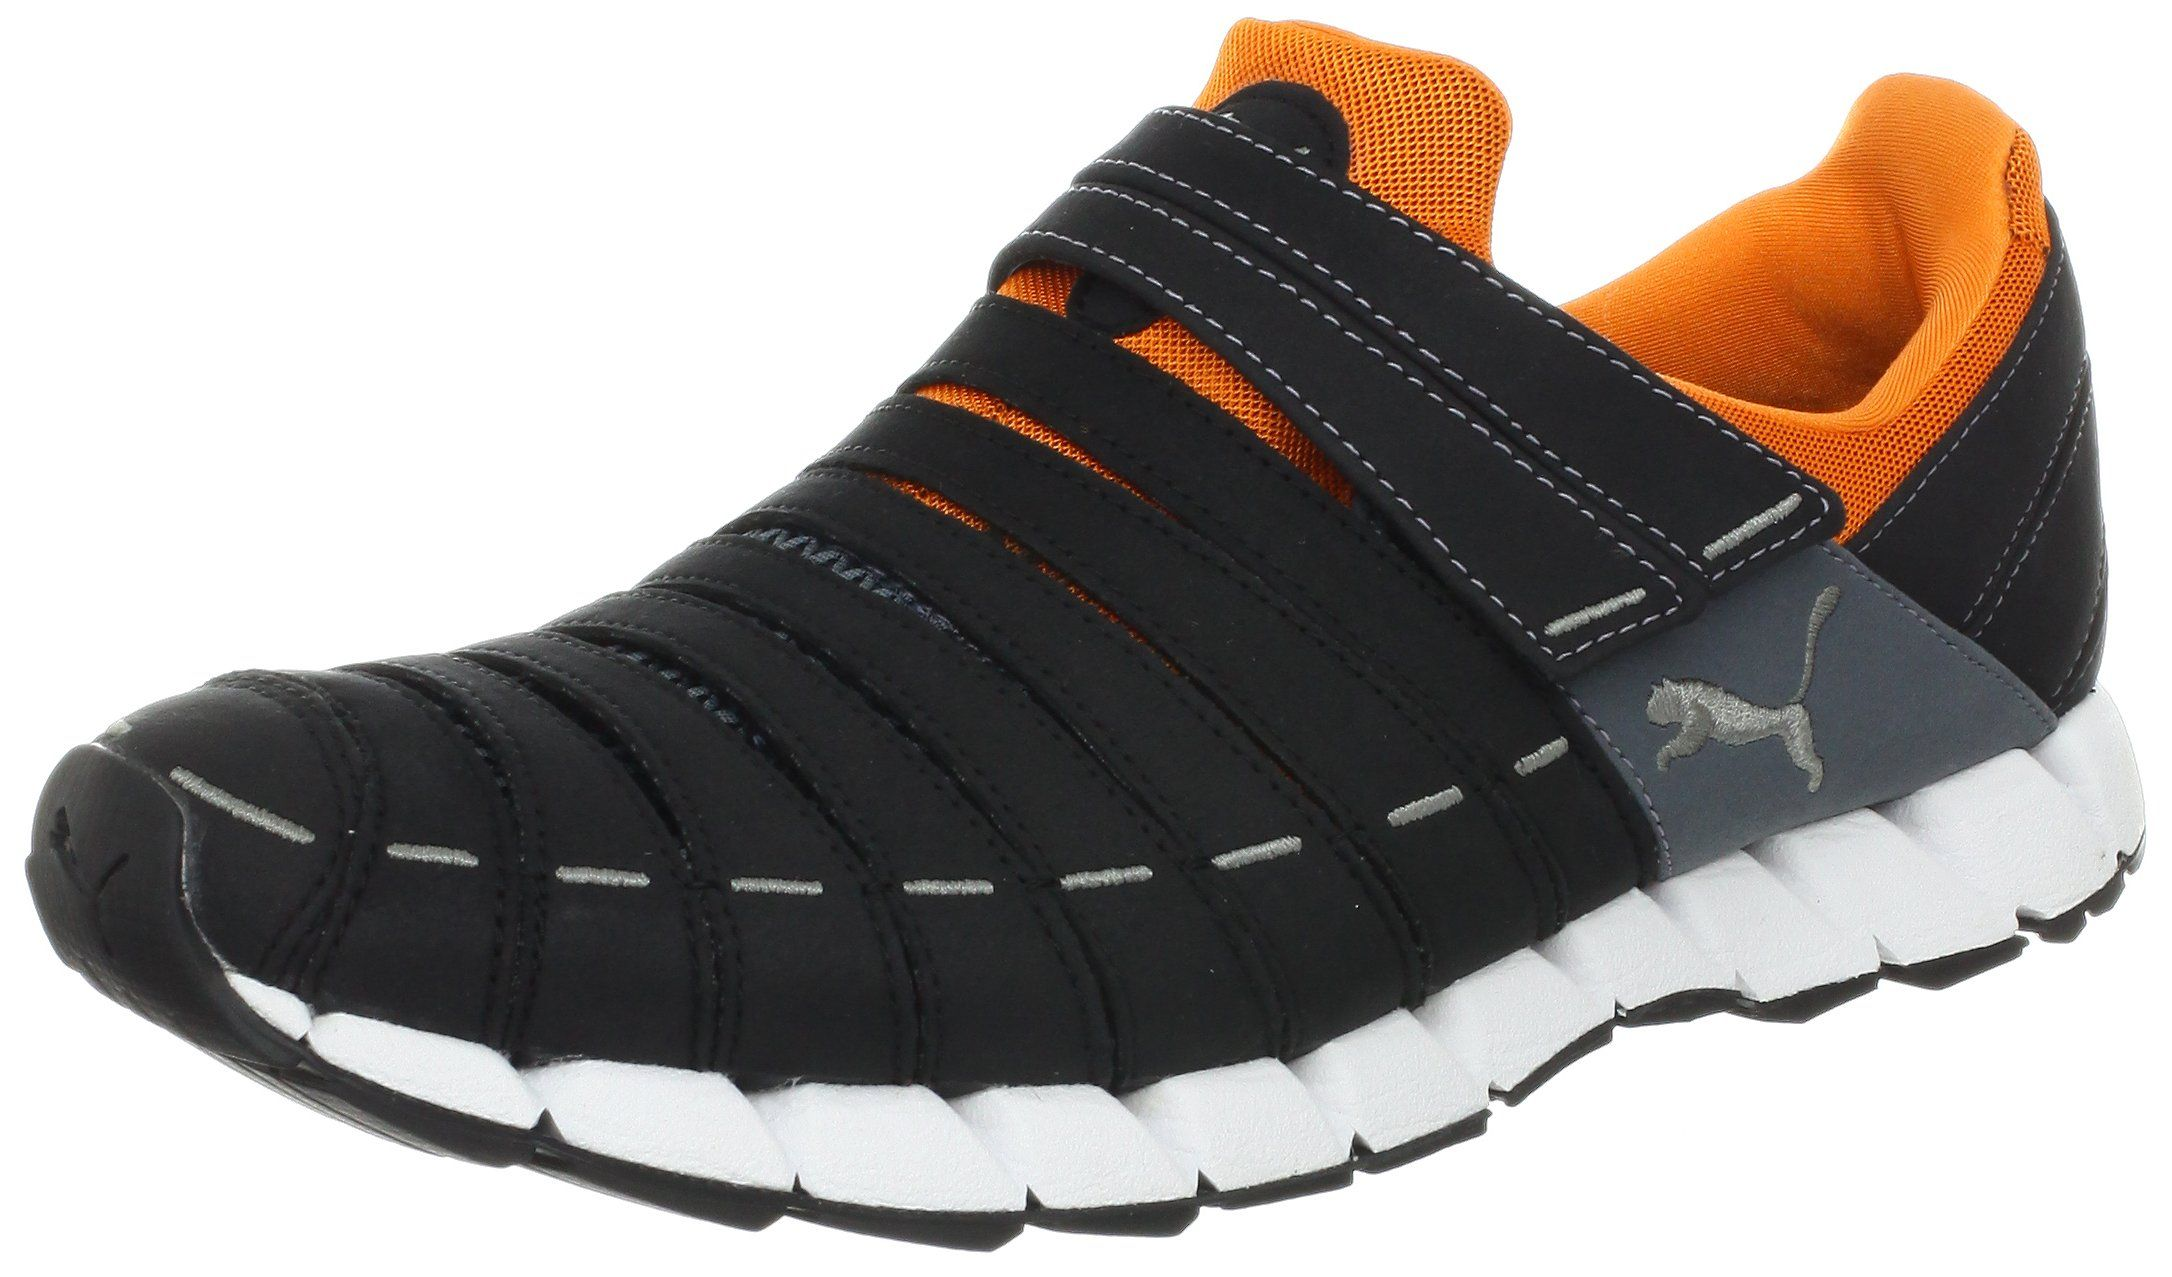 574ad22b1259 PUMA Men s Osu NM Running Shoe